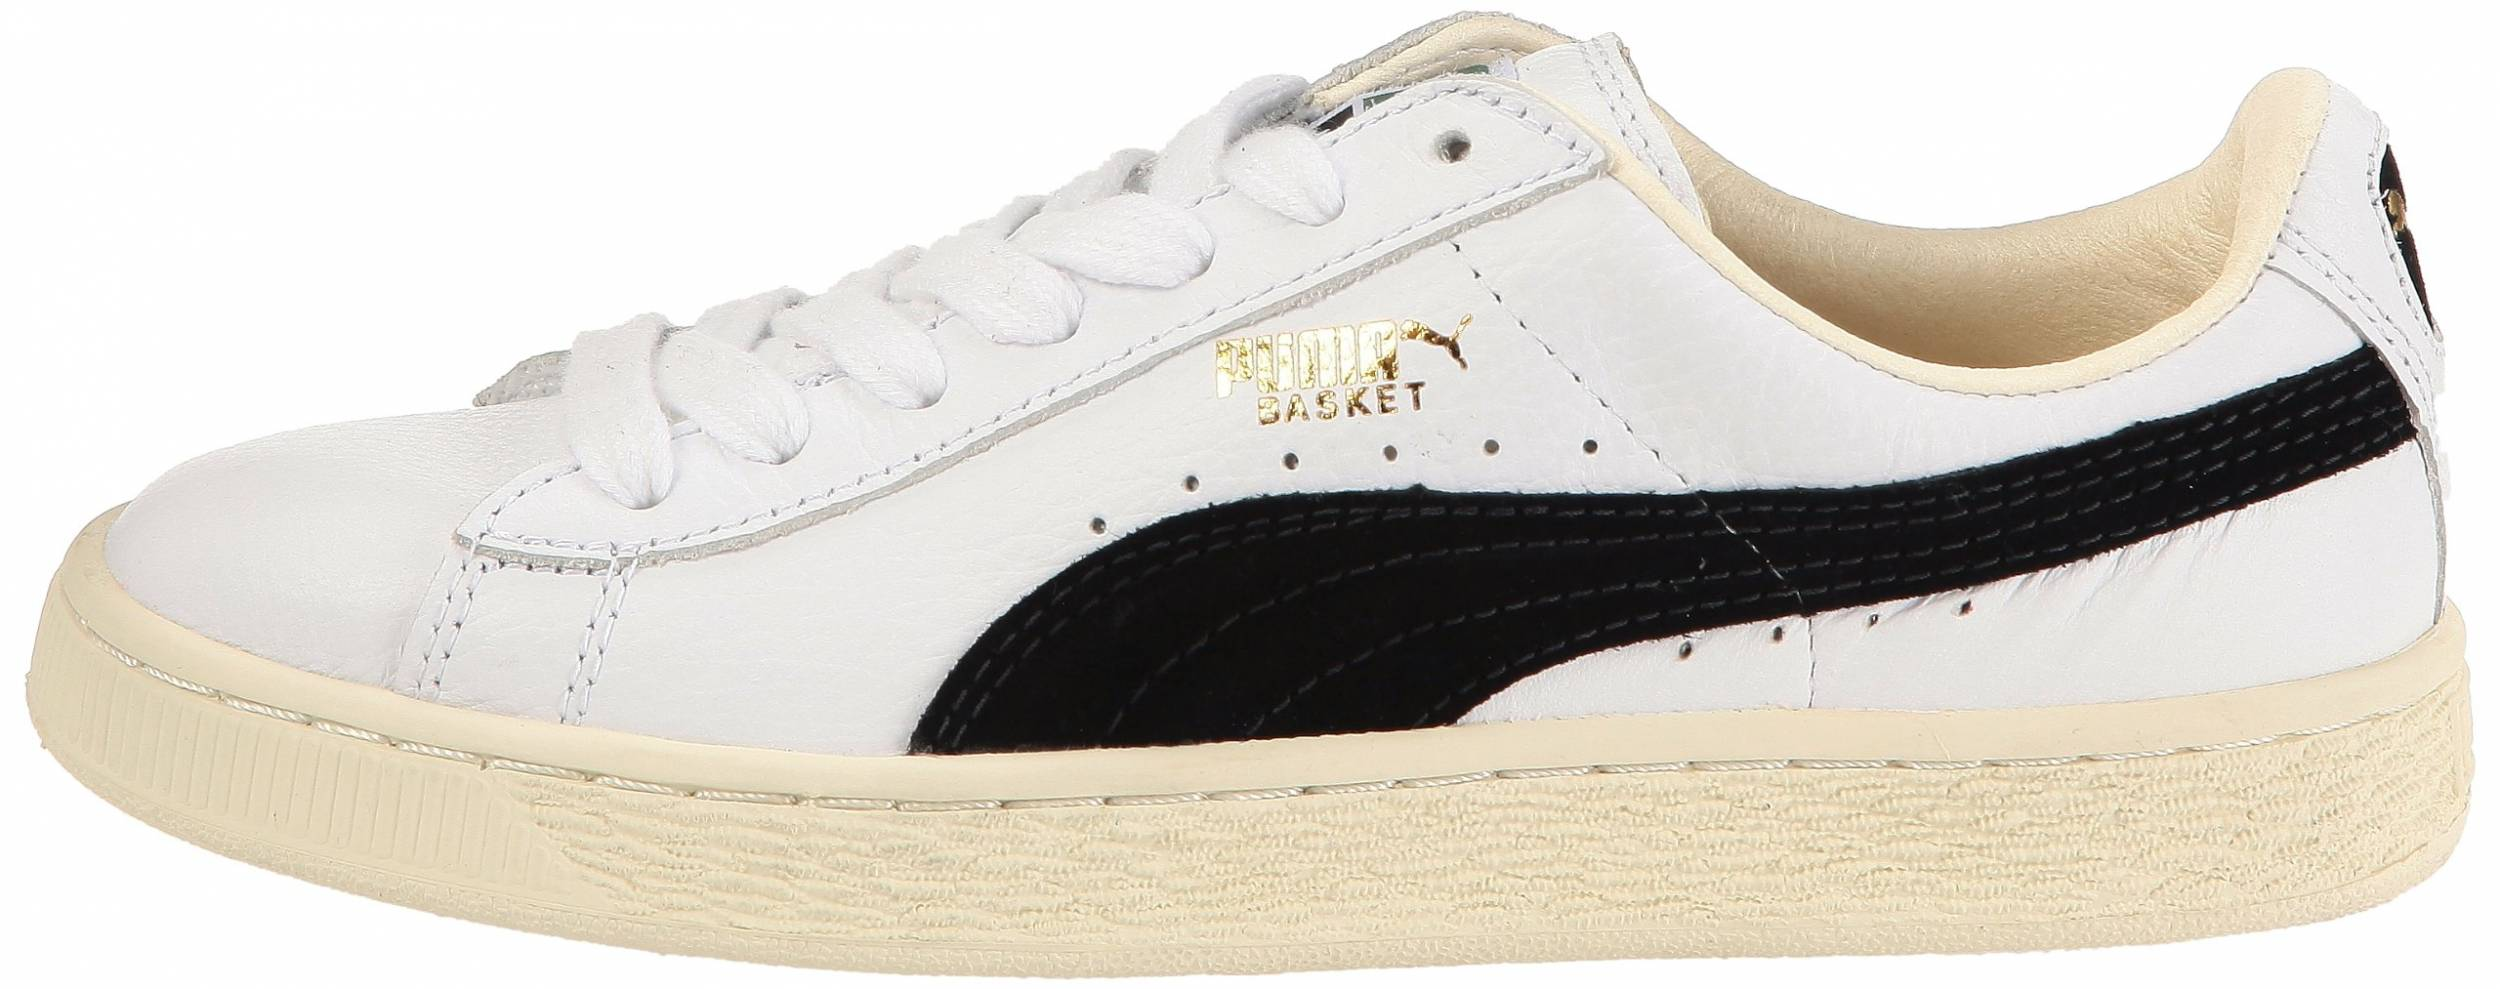 Boquilla Anfibio tribu  Save 27% on Puma Basket Sneakers (27 Models in Stock) | RunRepeat